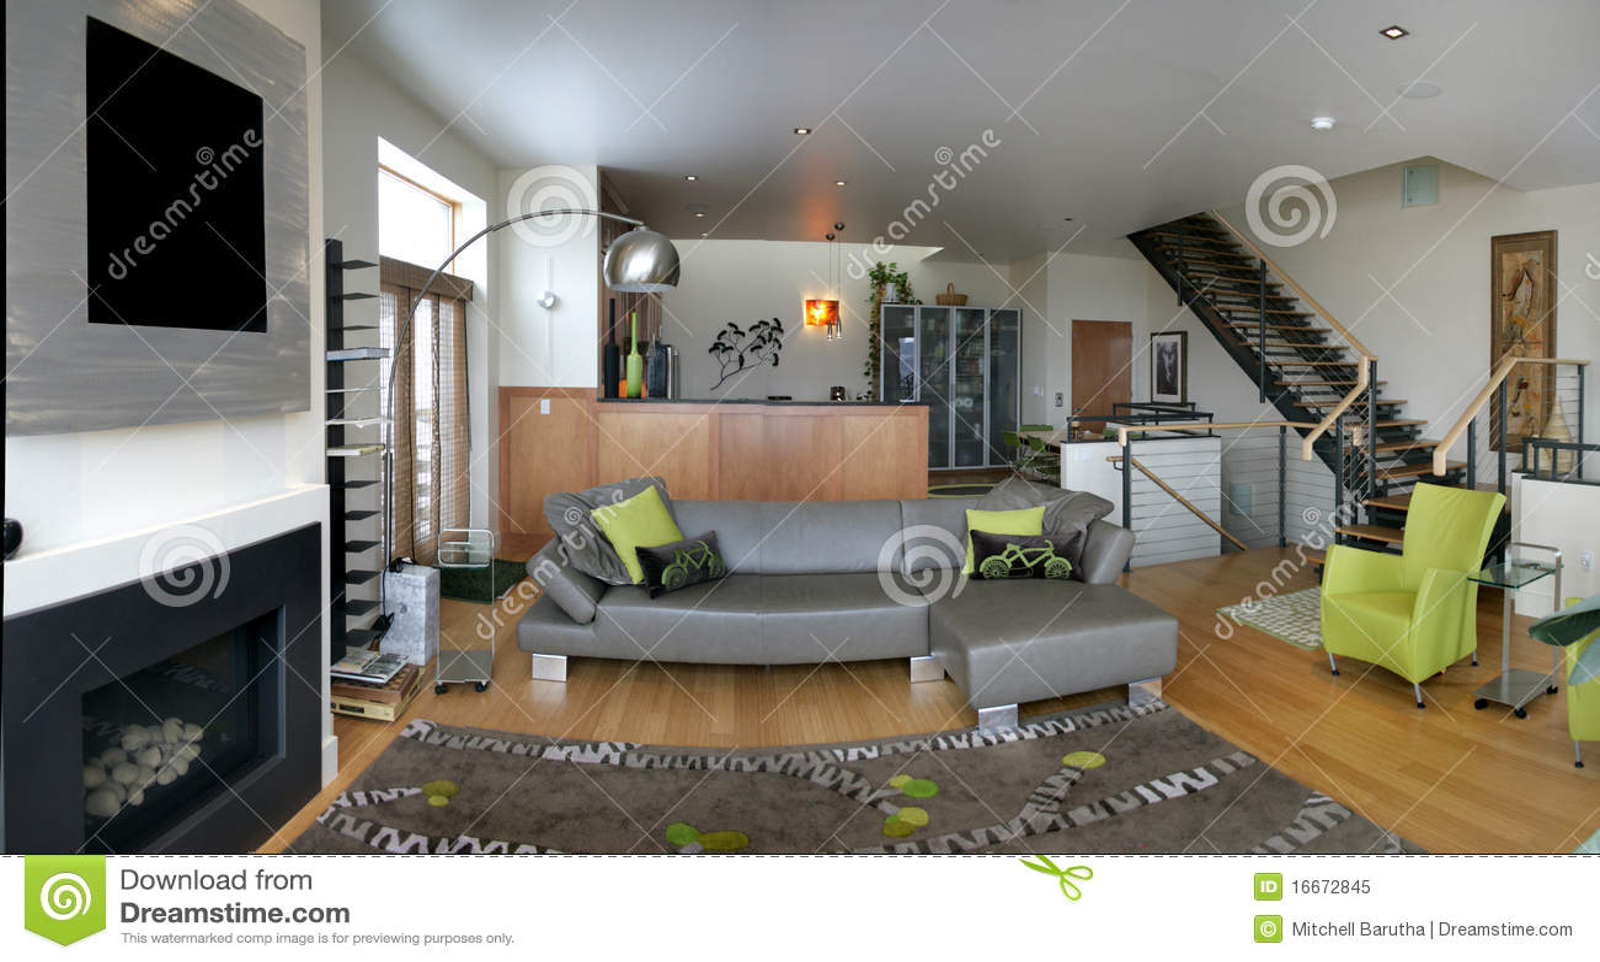 Loft Living Room Royalty Free Stock Photo  Image 16672845